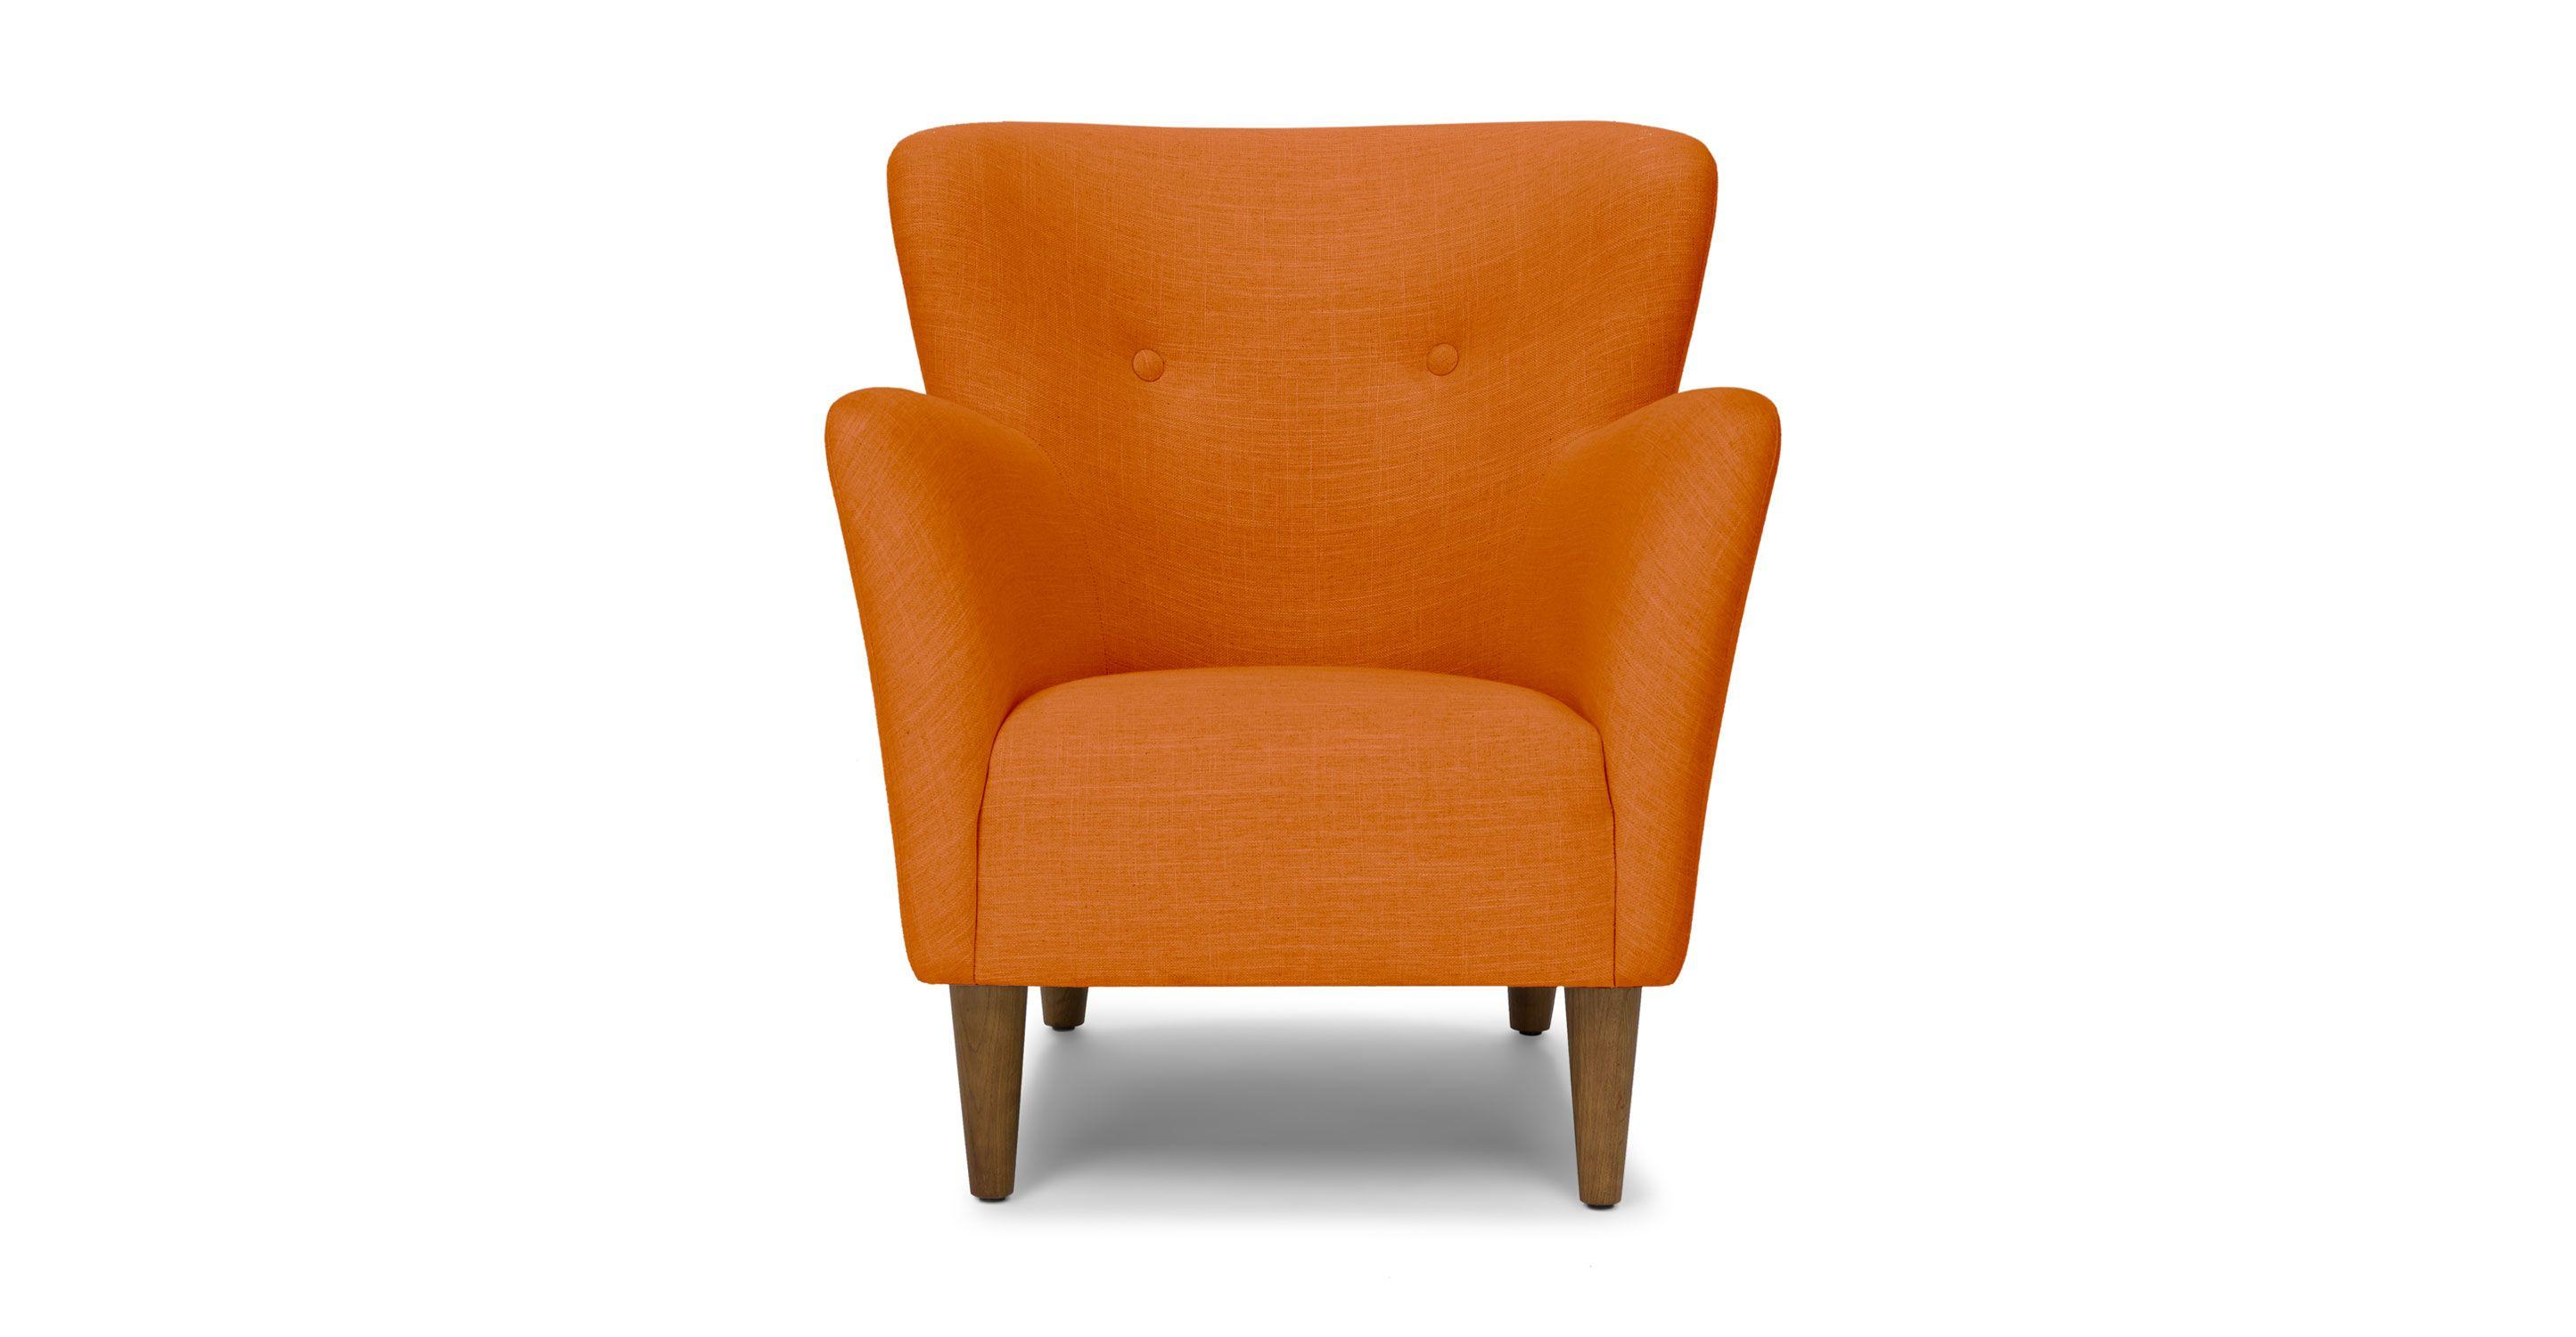 Happy Papaya Orange Armchair   Lounge Chairs   Article   Modern,  Mid Century And